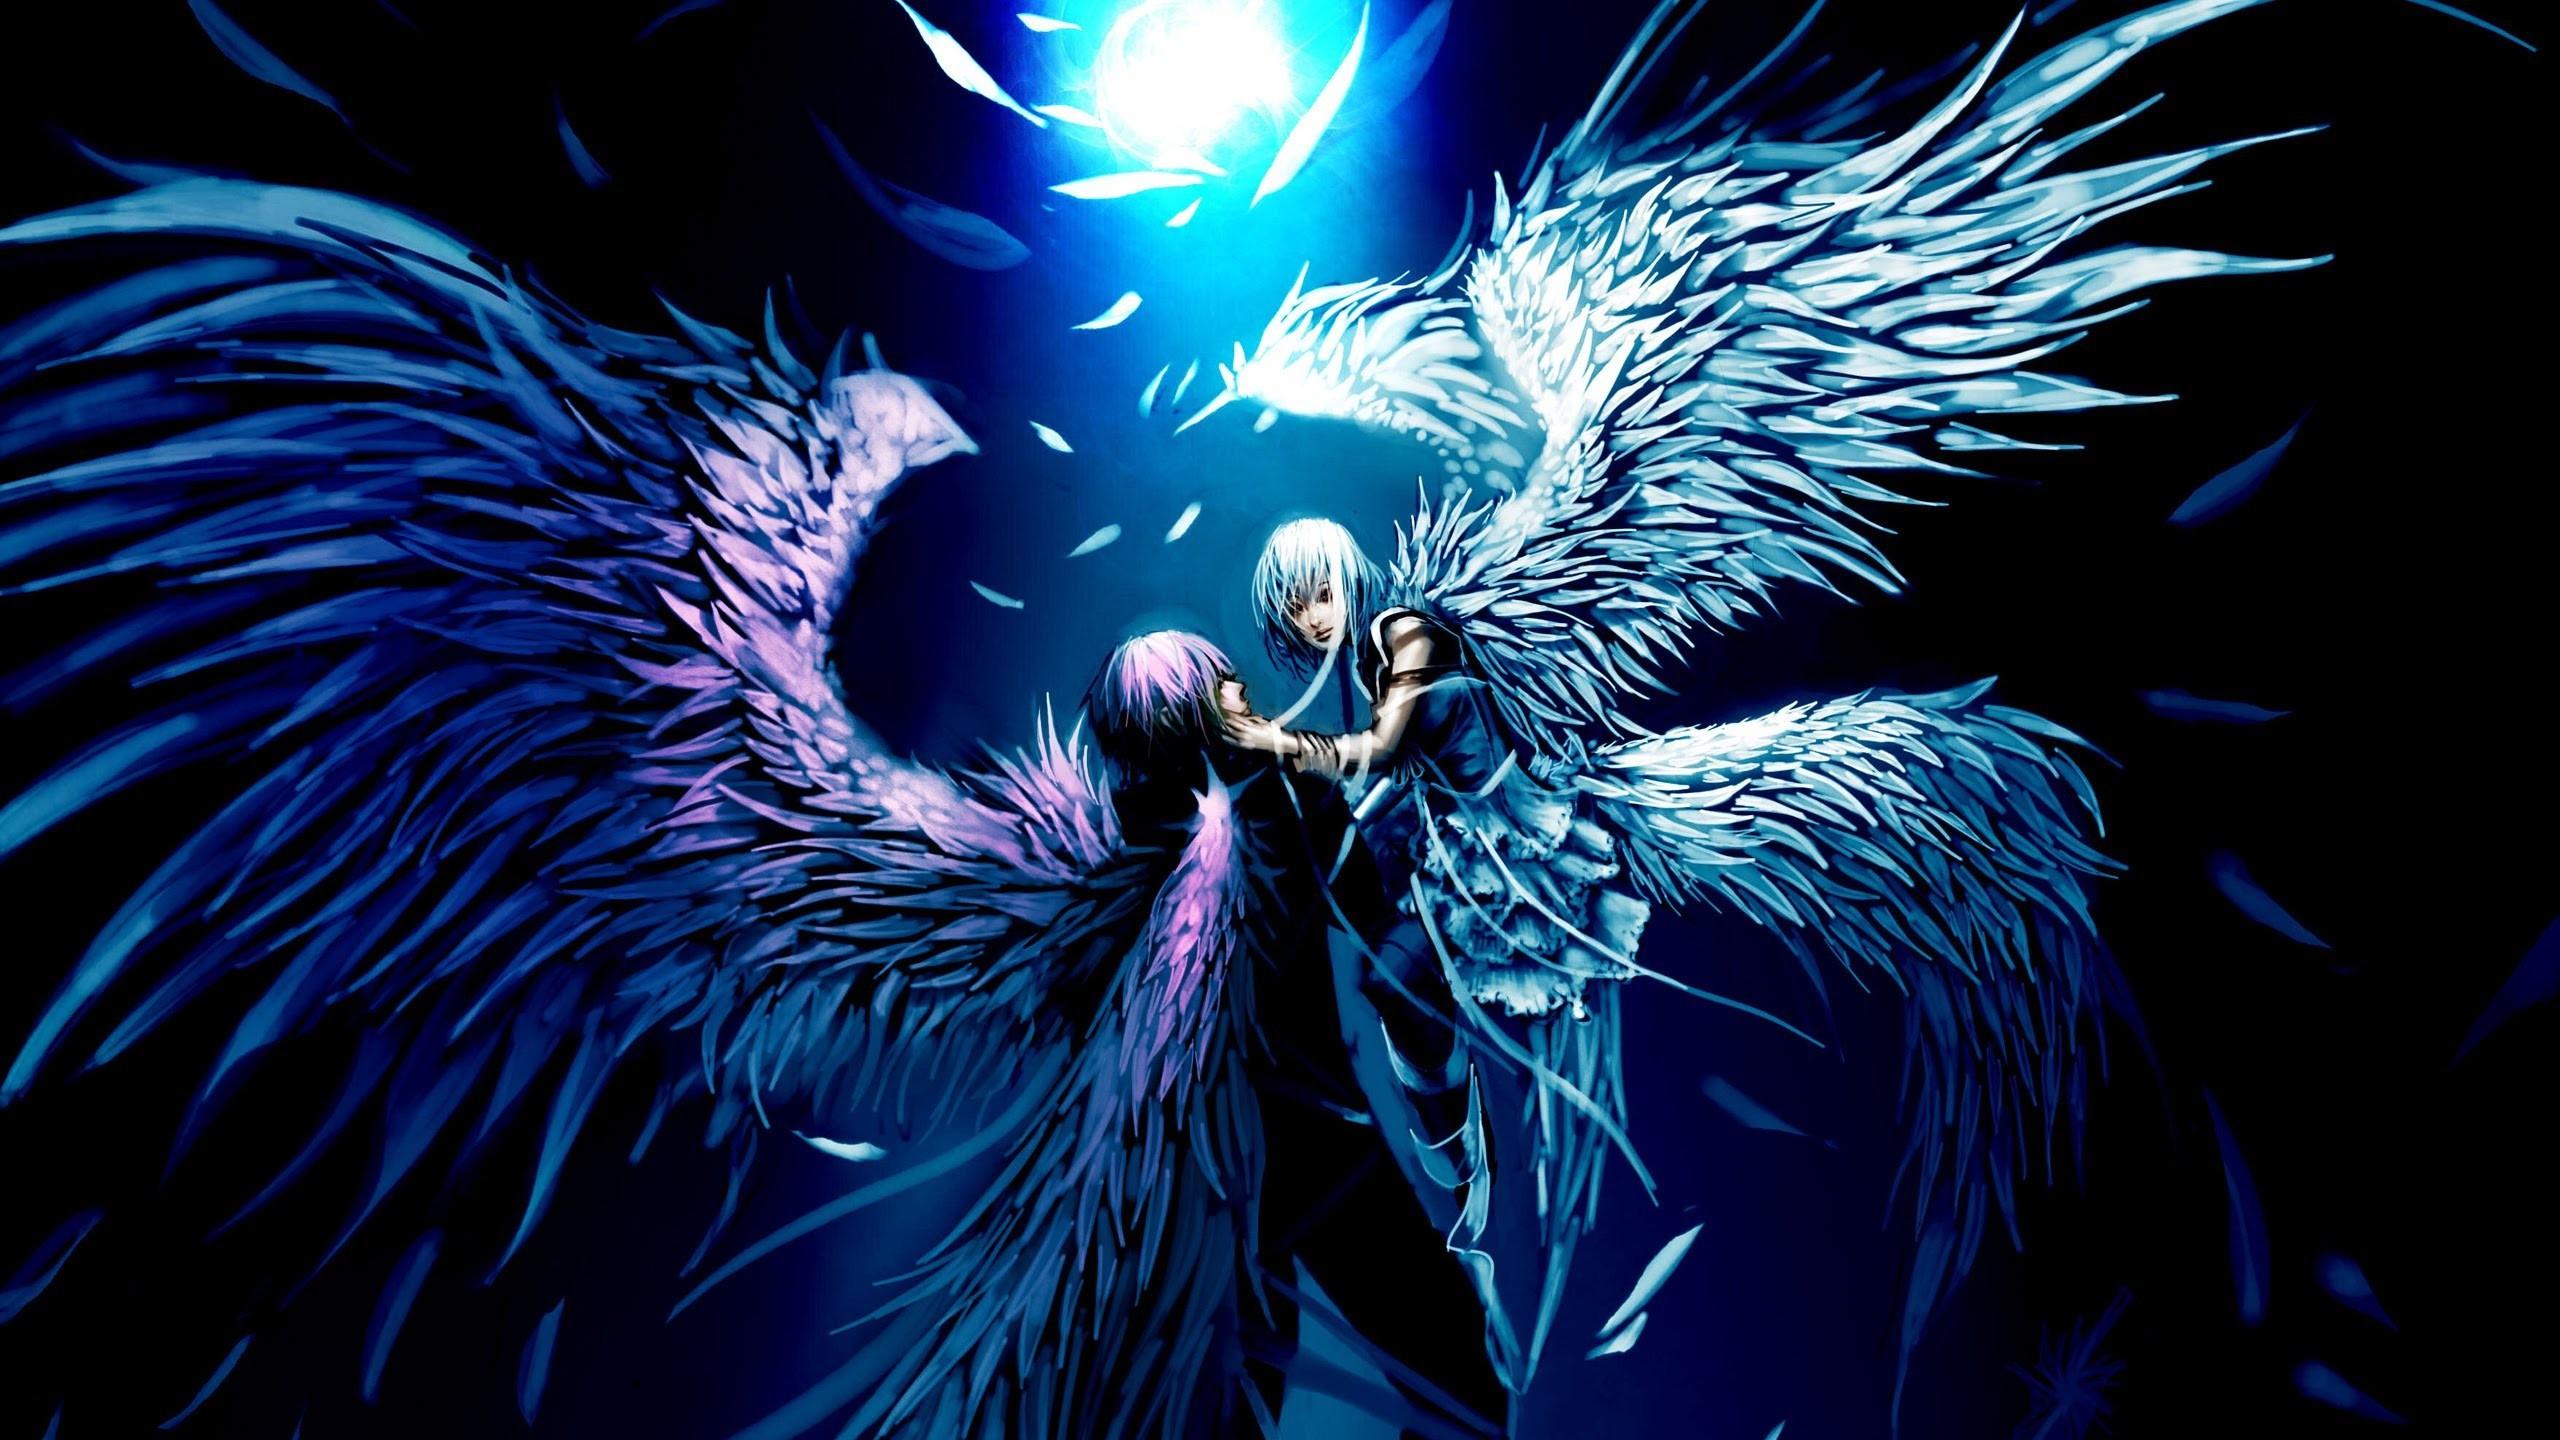 Angel Anime Wallpapers HD.